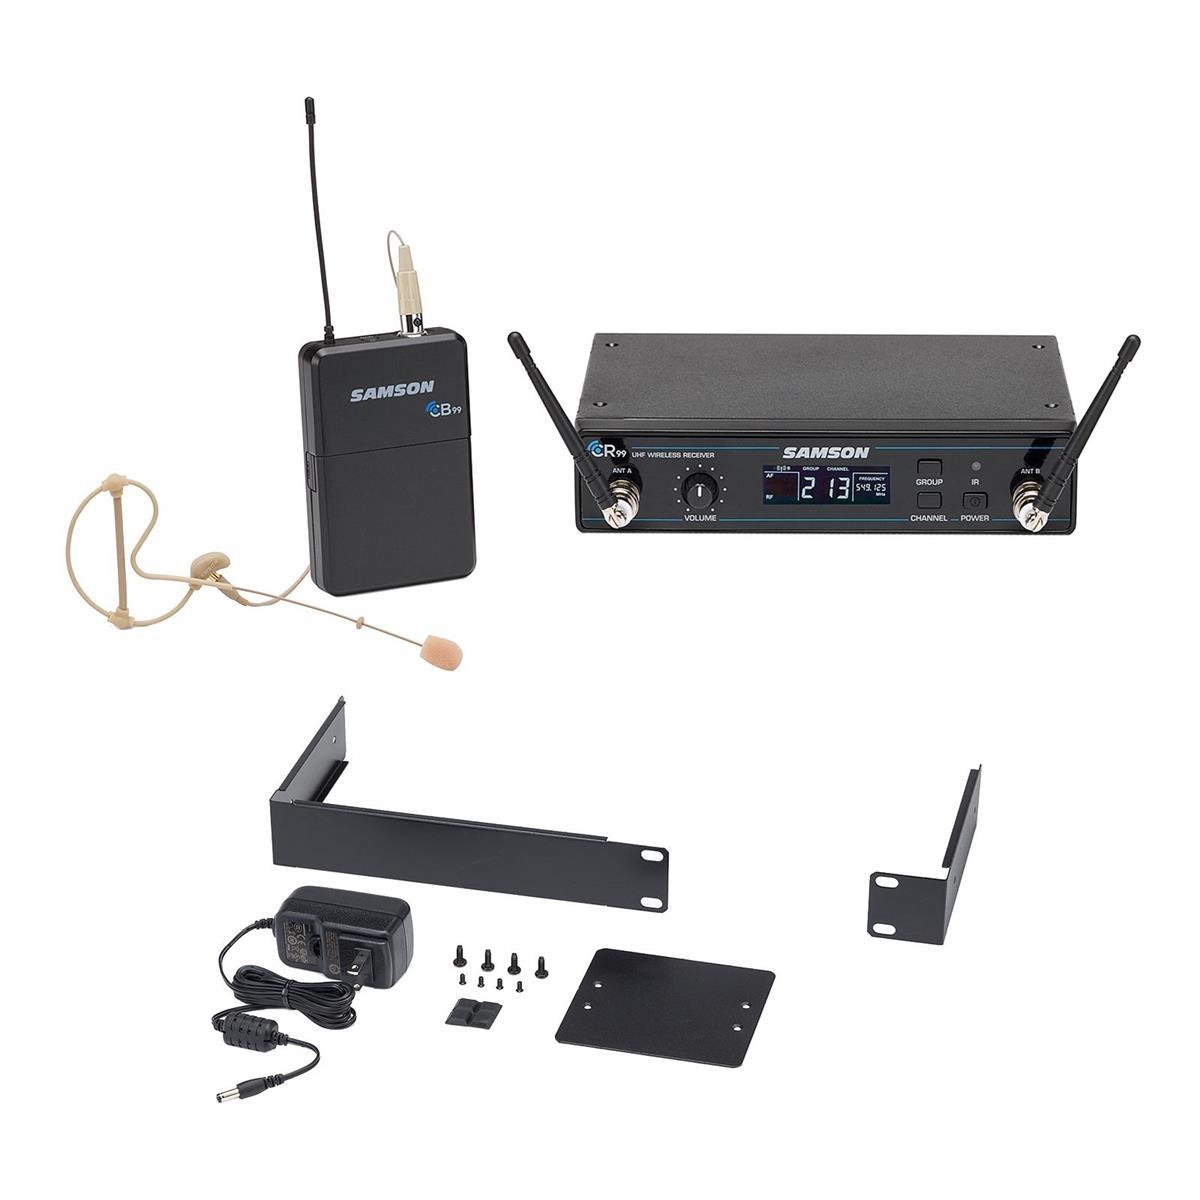 Samson CONCERT 99 UHF Earset System - C (638-662 MHz)